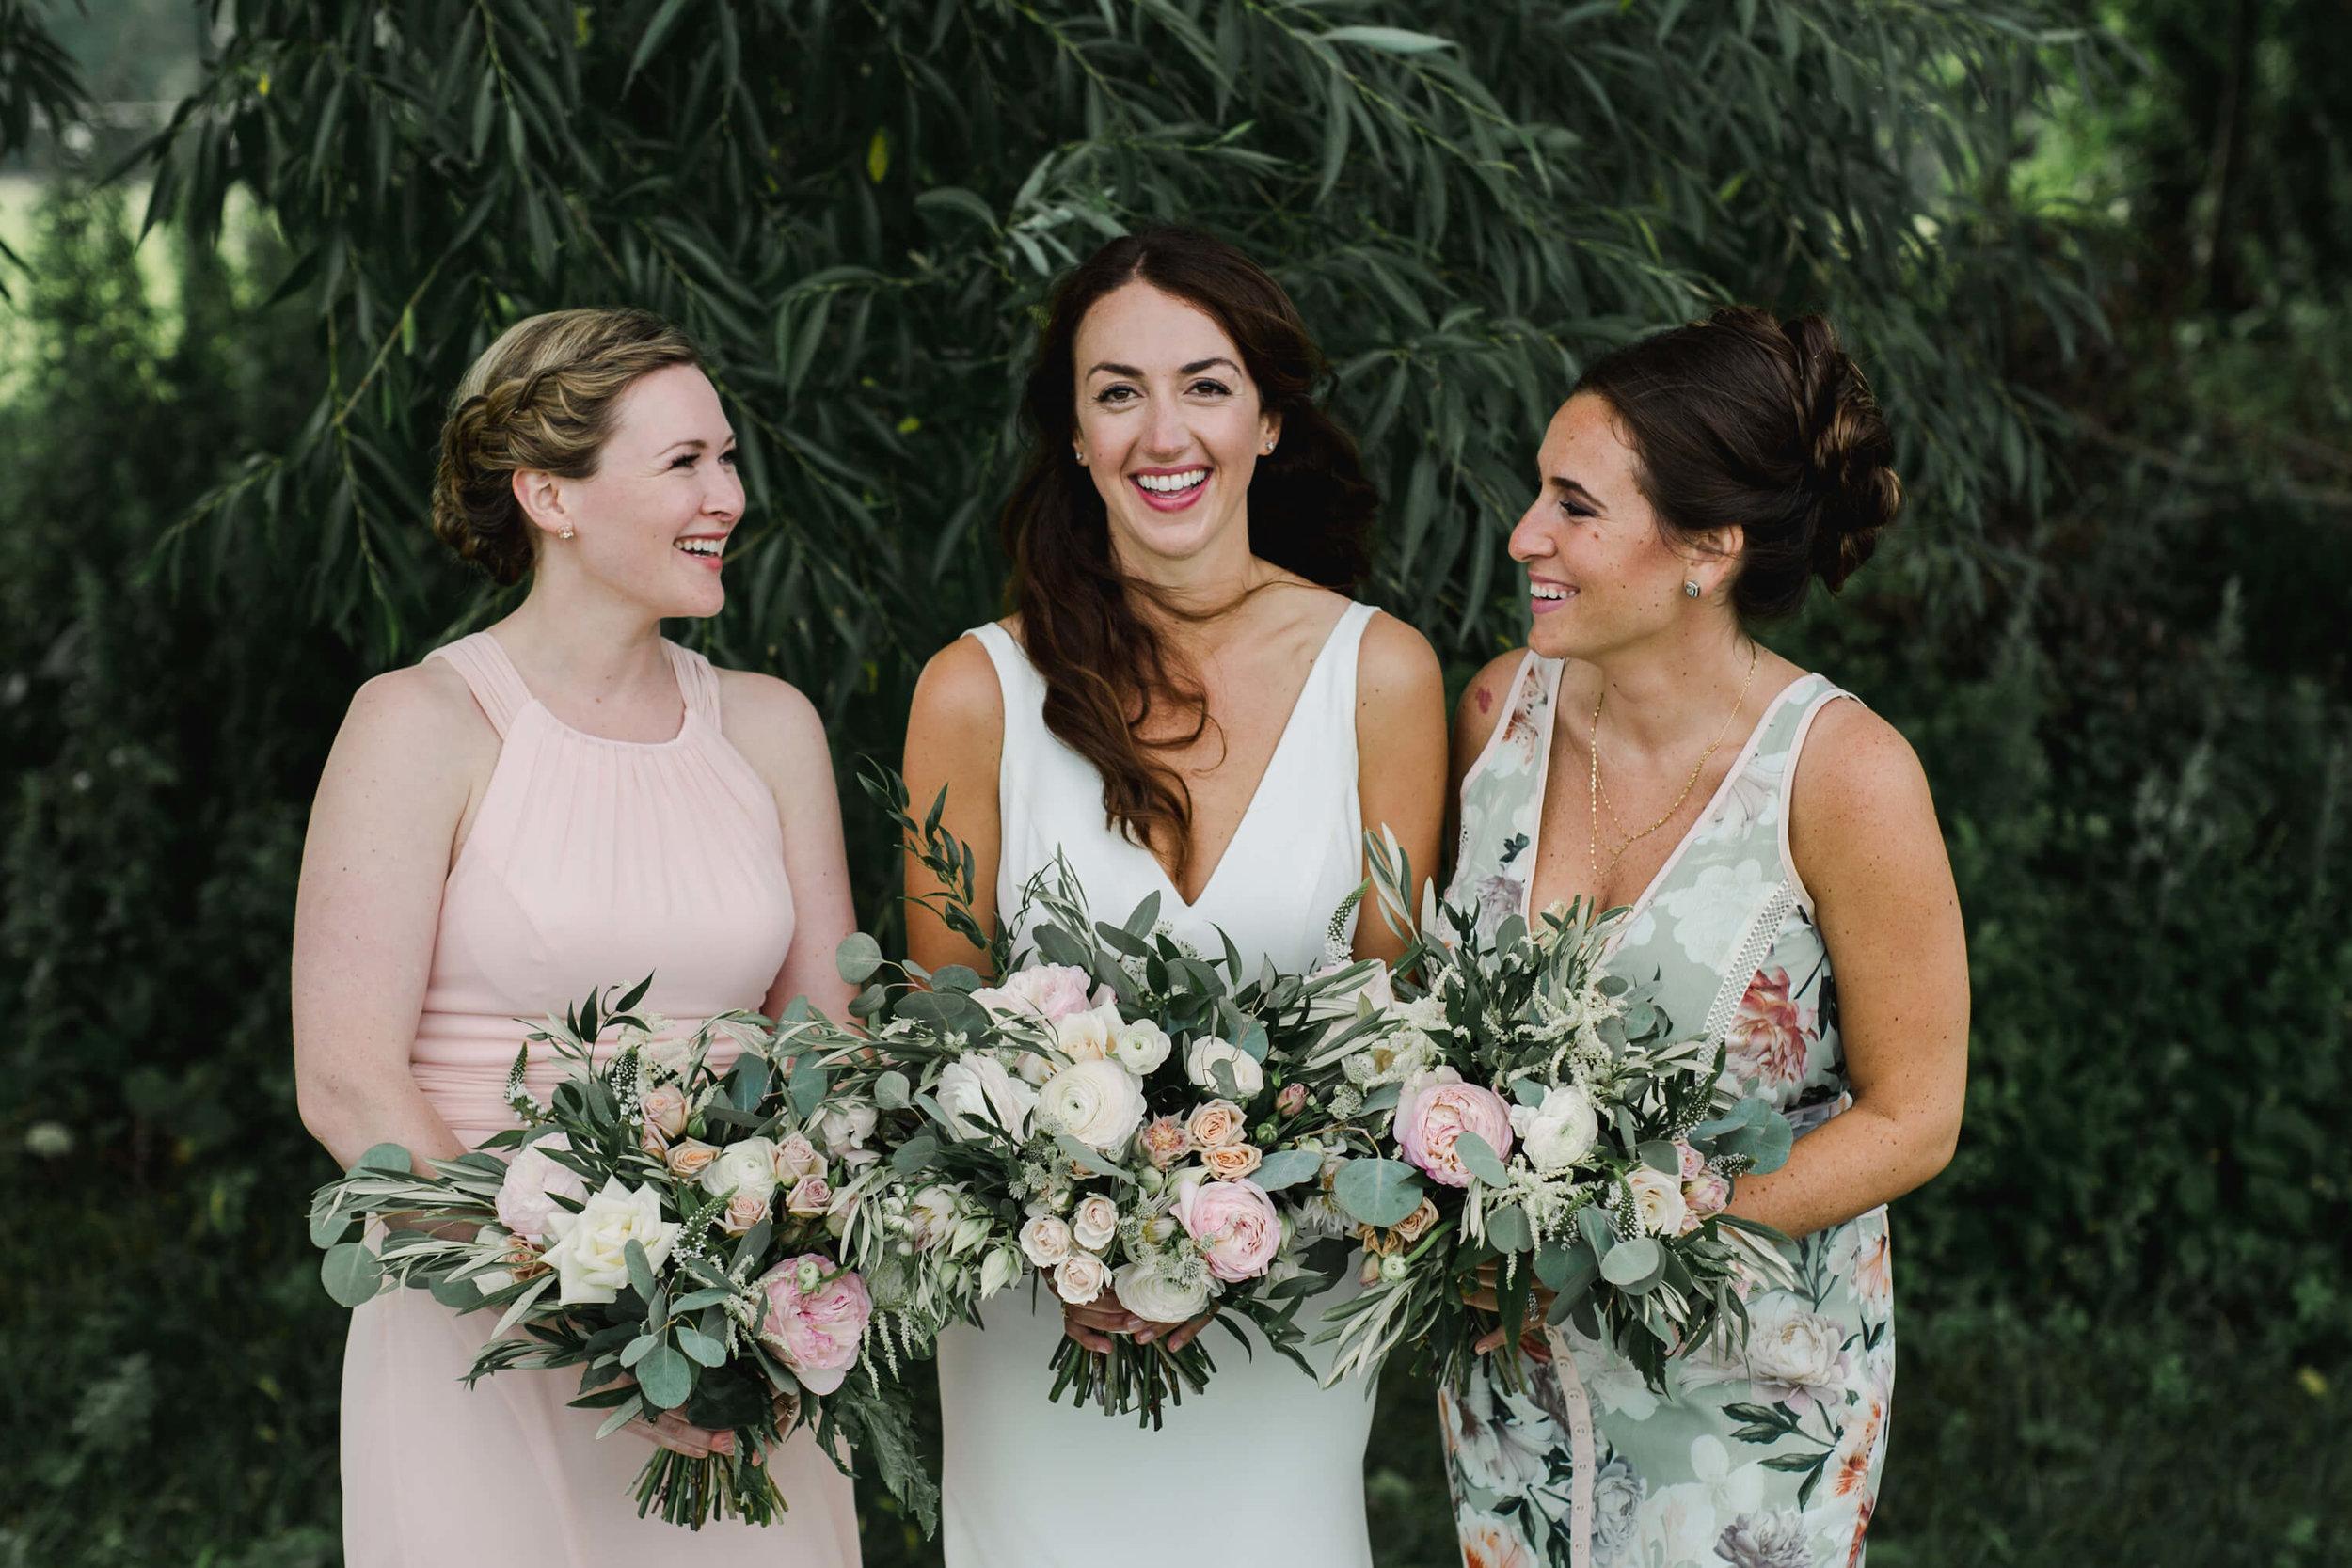 blush-light-green-mismatched-bridesmaids-dresses.jpg